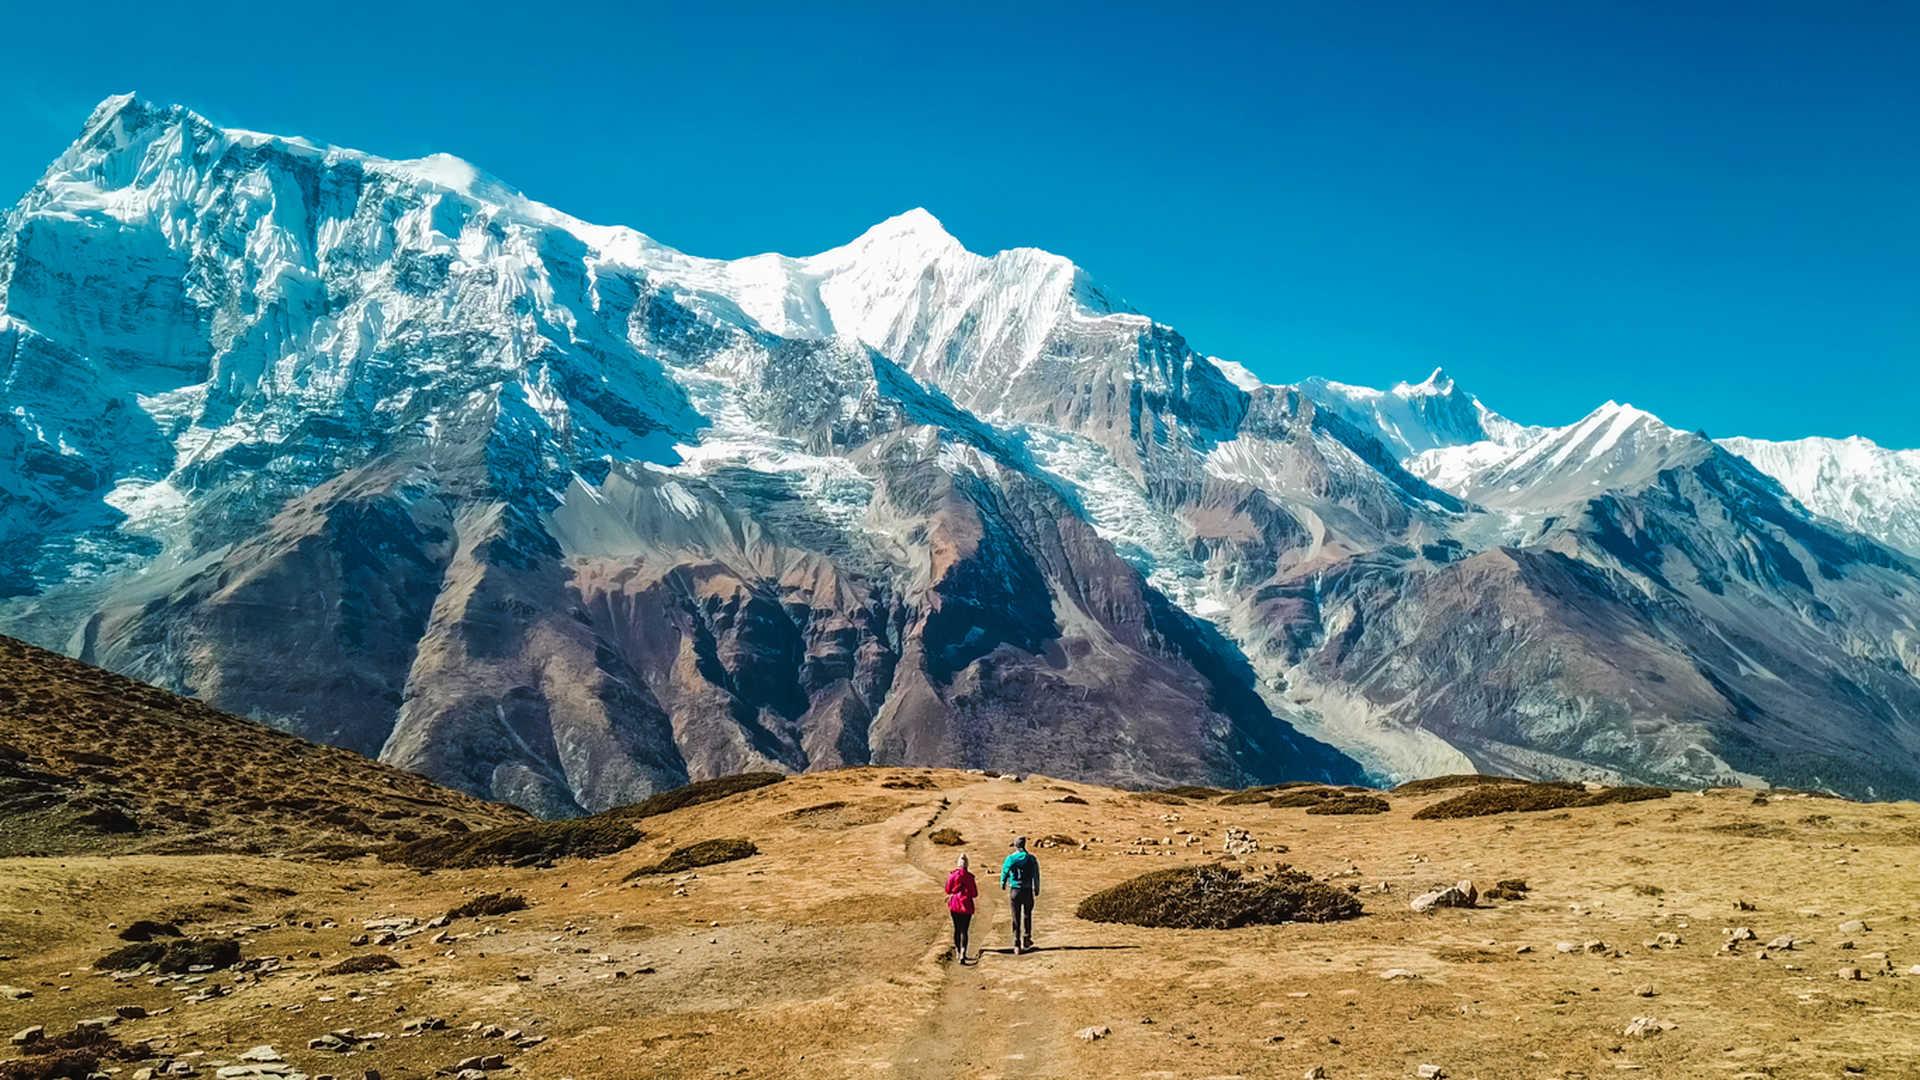 Hikers during the Annapurna circuit trek